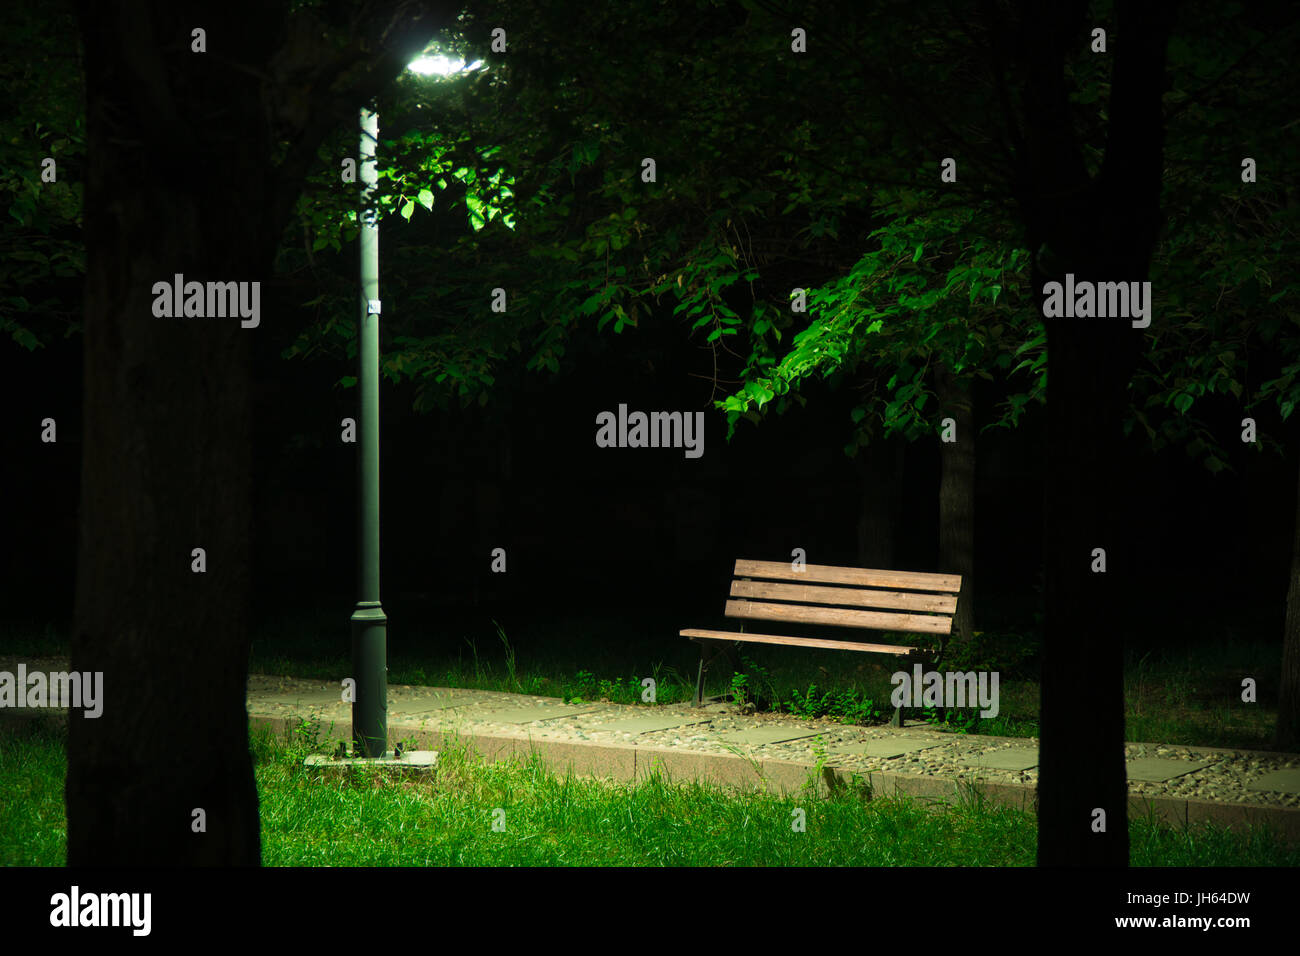 Panchina Con Lampioni Seduti : Giovanni prati pensieri miei e non miei la panchina